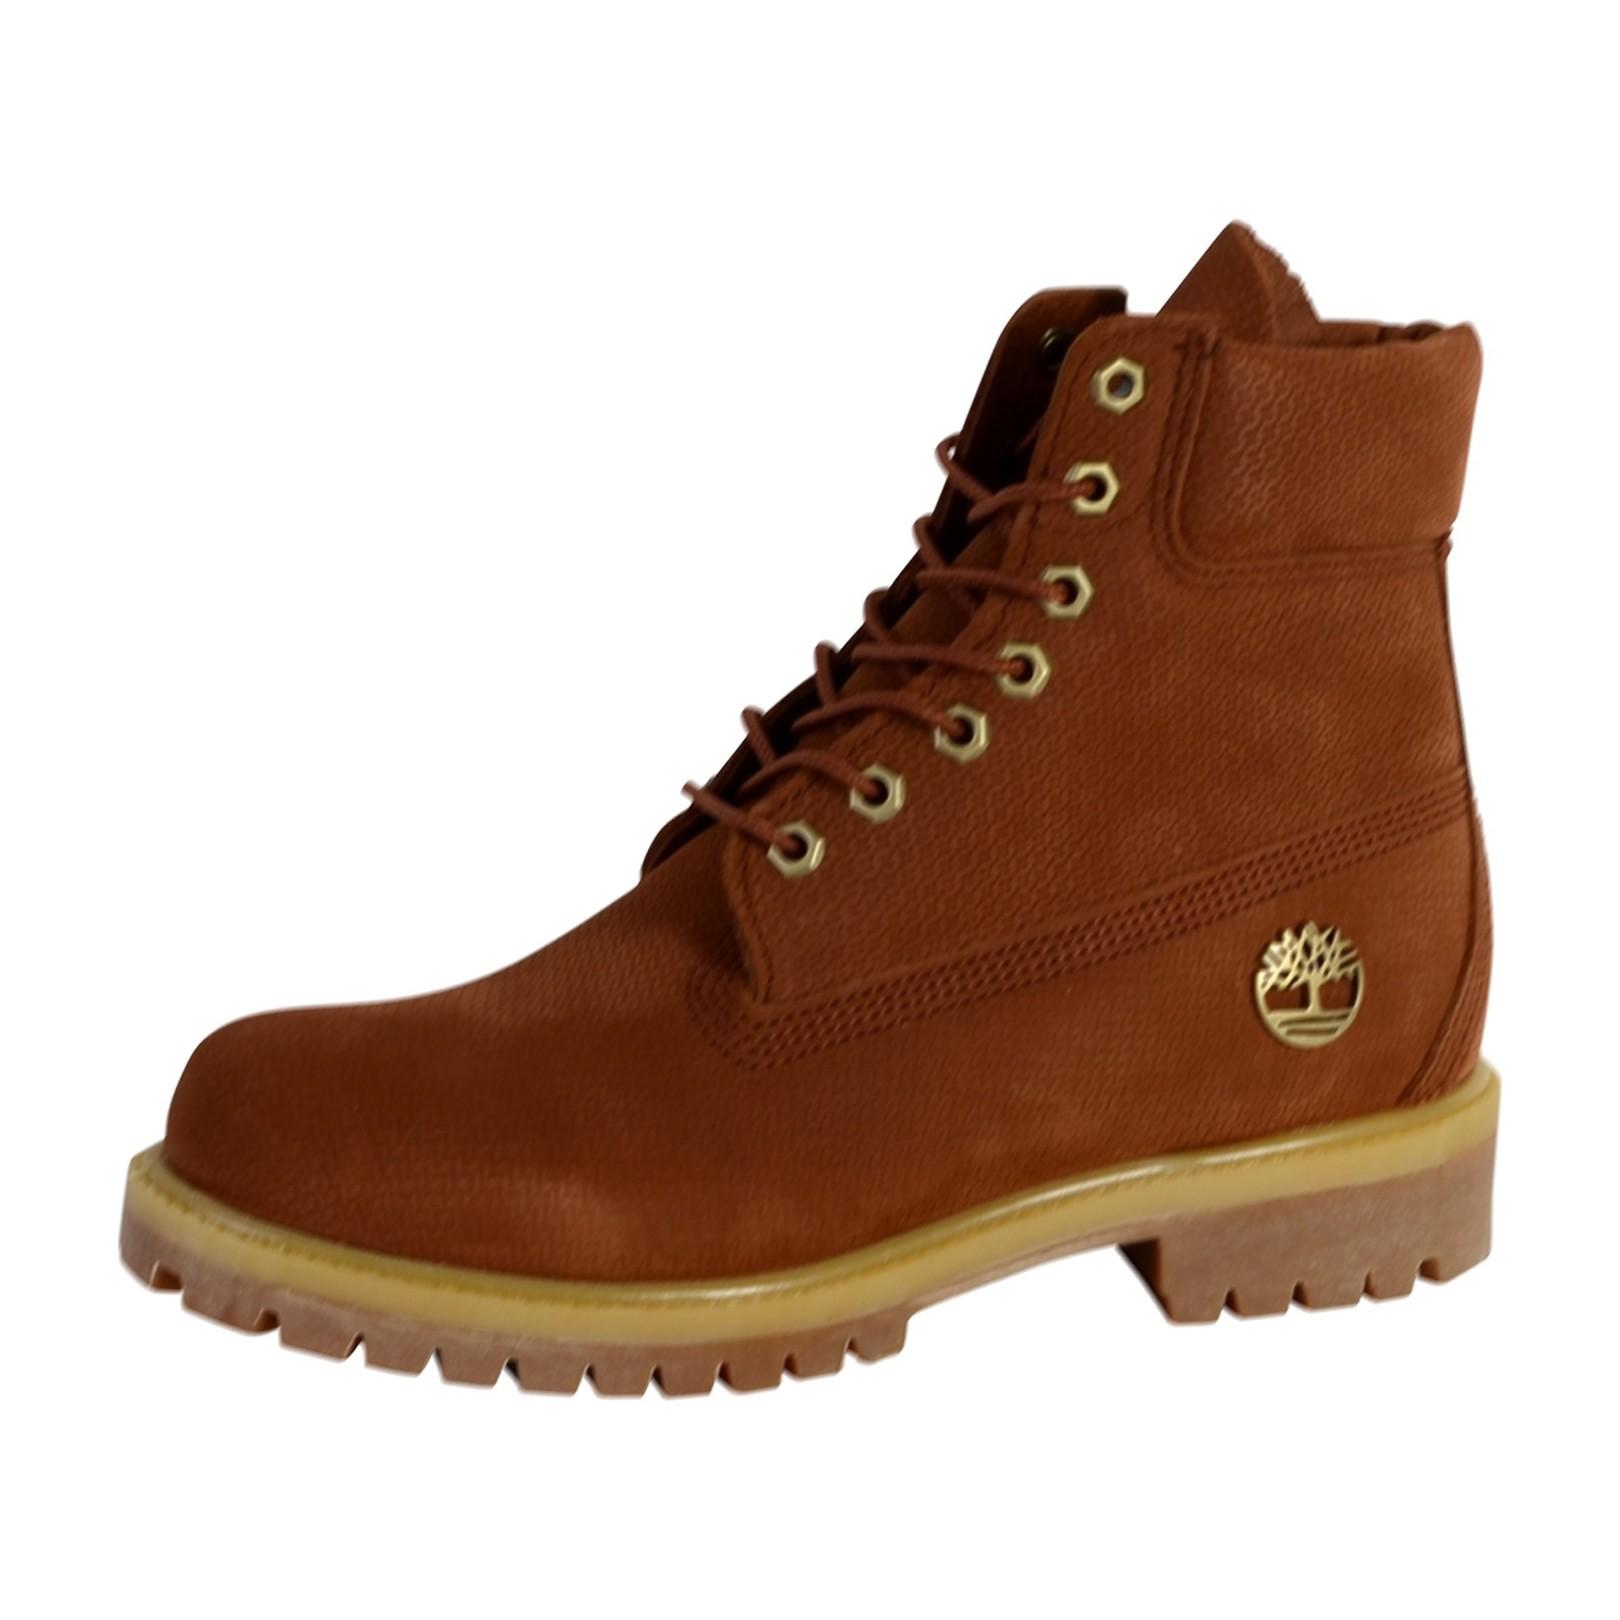 Chaussures Timberland Premium 6 Inch A1U8K